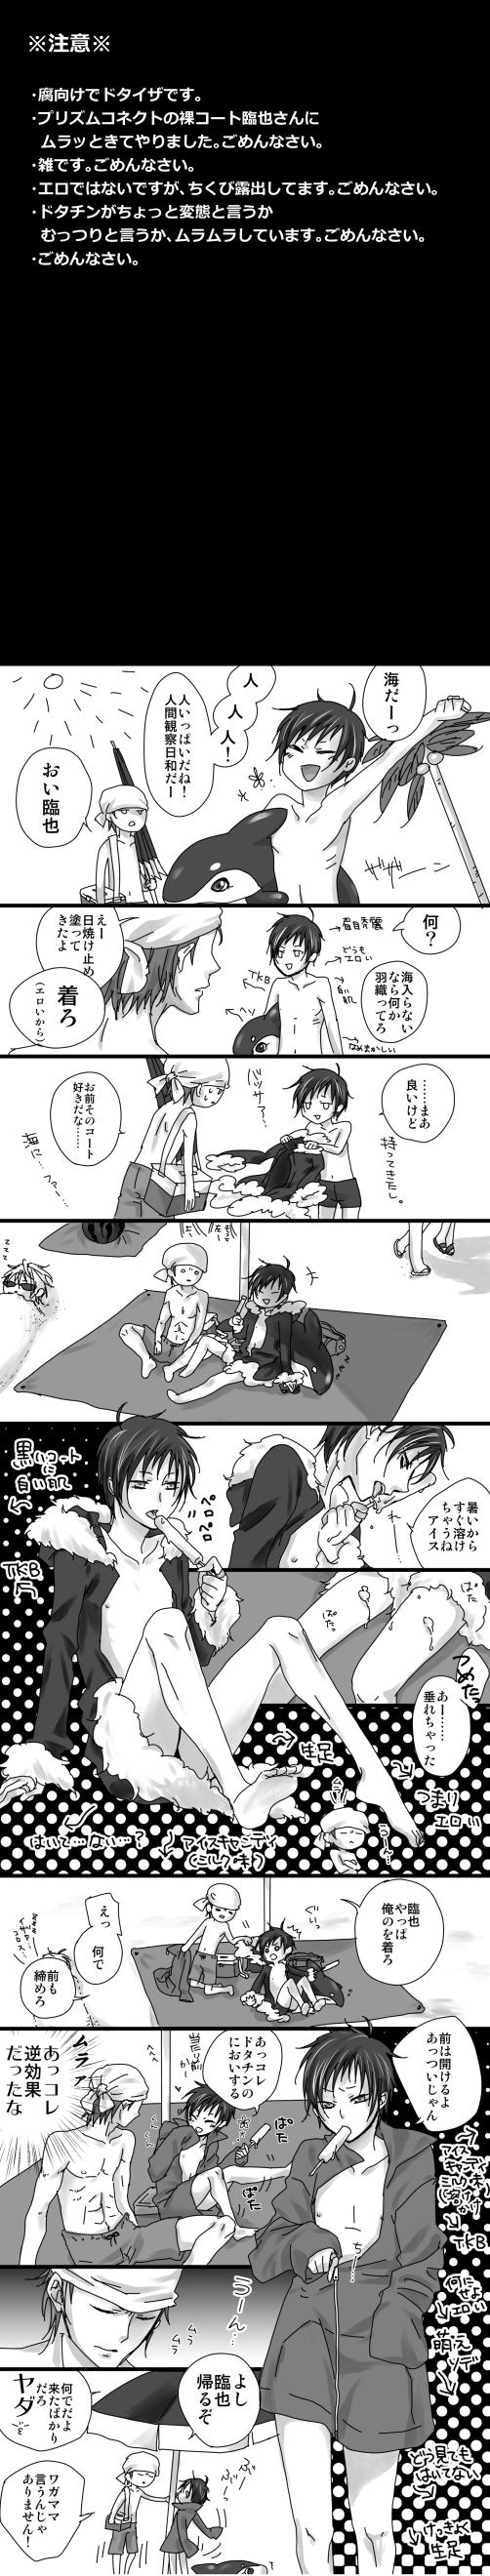 Tags: Anime, Pixiv Id 246368, DURARARA!!, Kadota Kyouhei, Orihara Izaya, Pixiv, Translation Request, Fanart